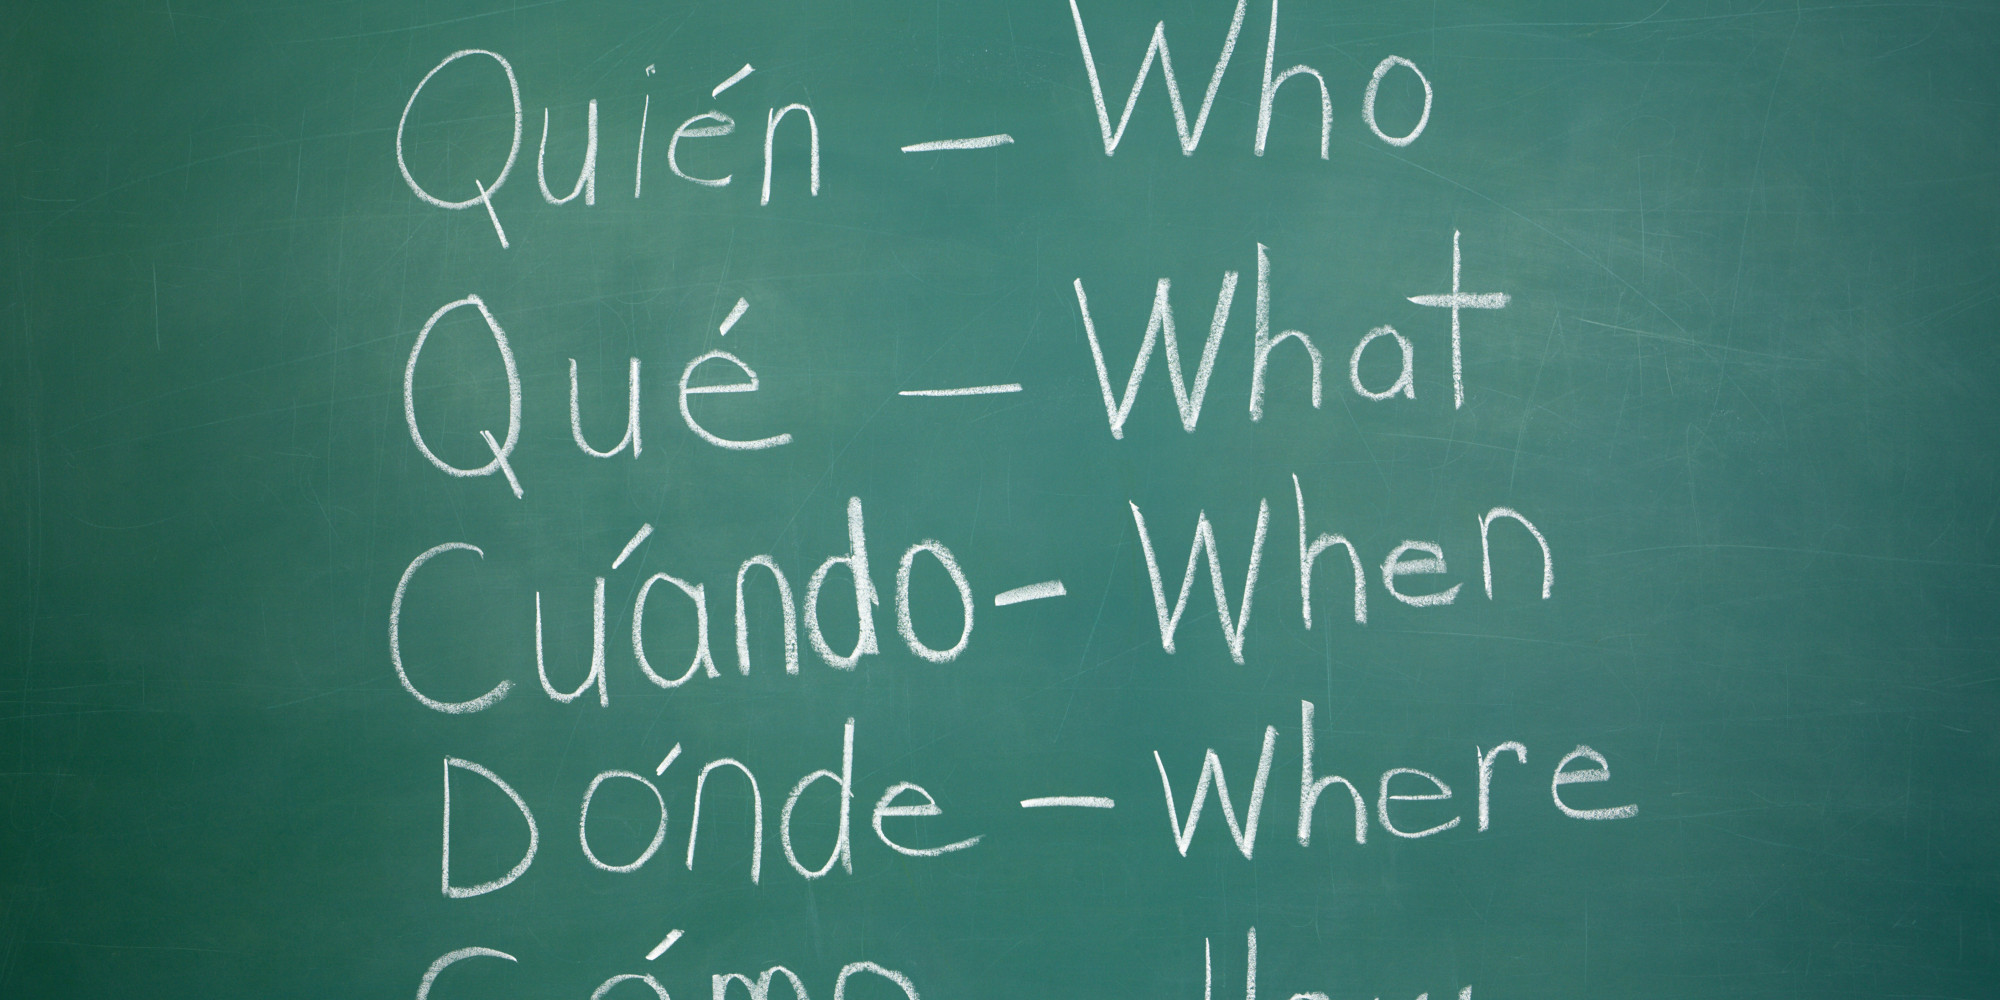 İspanyolca, İspanyol dili